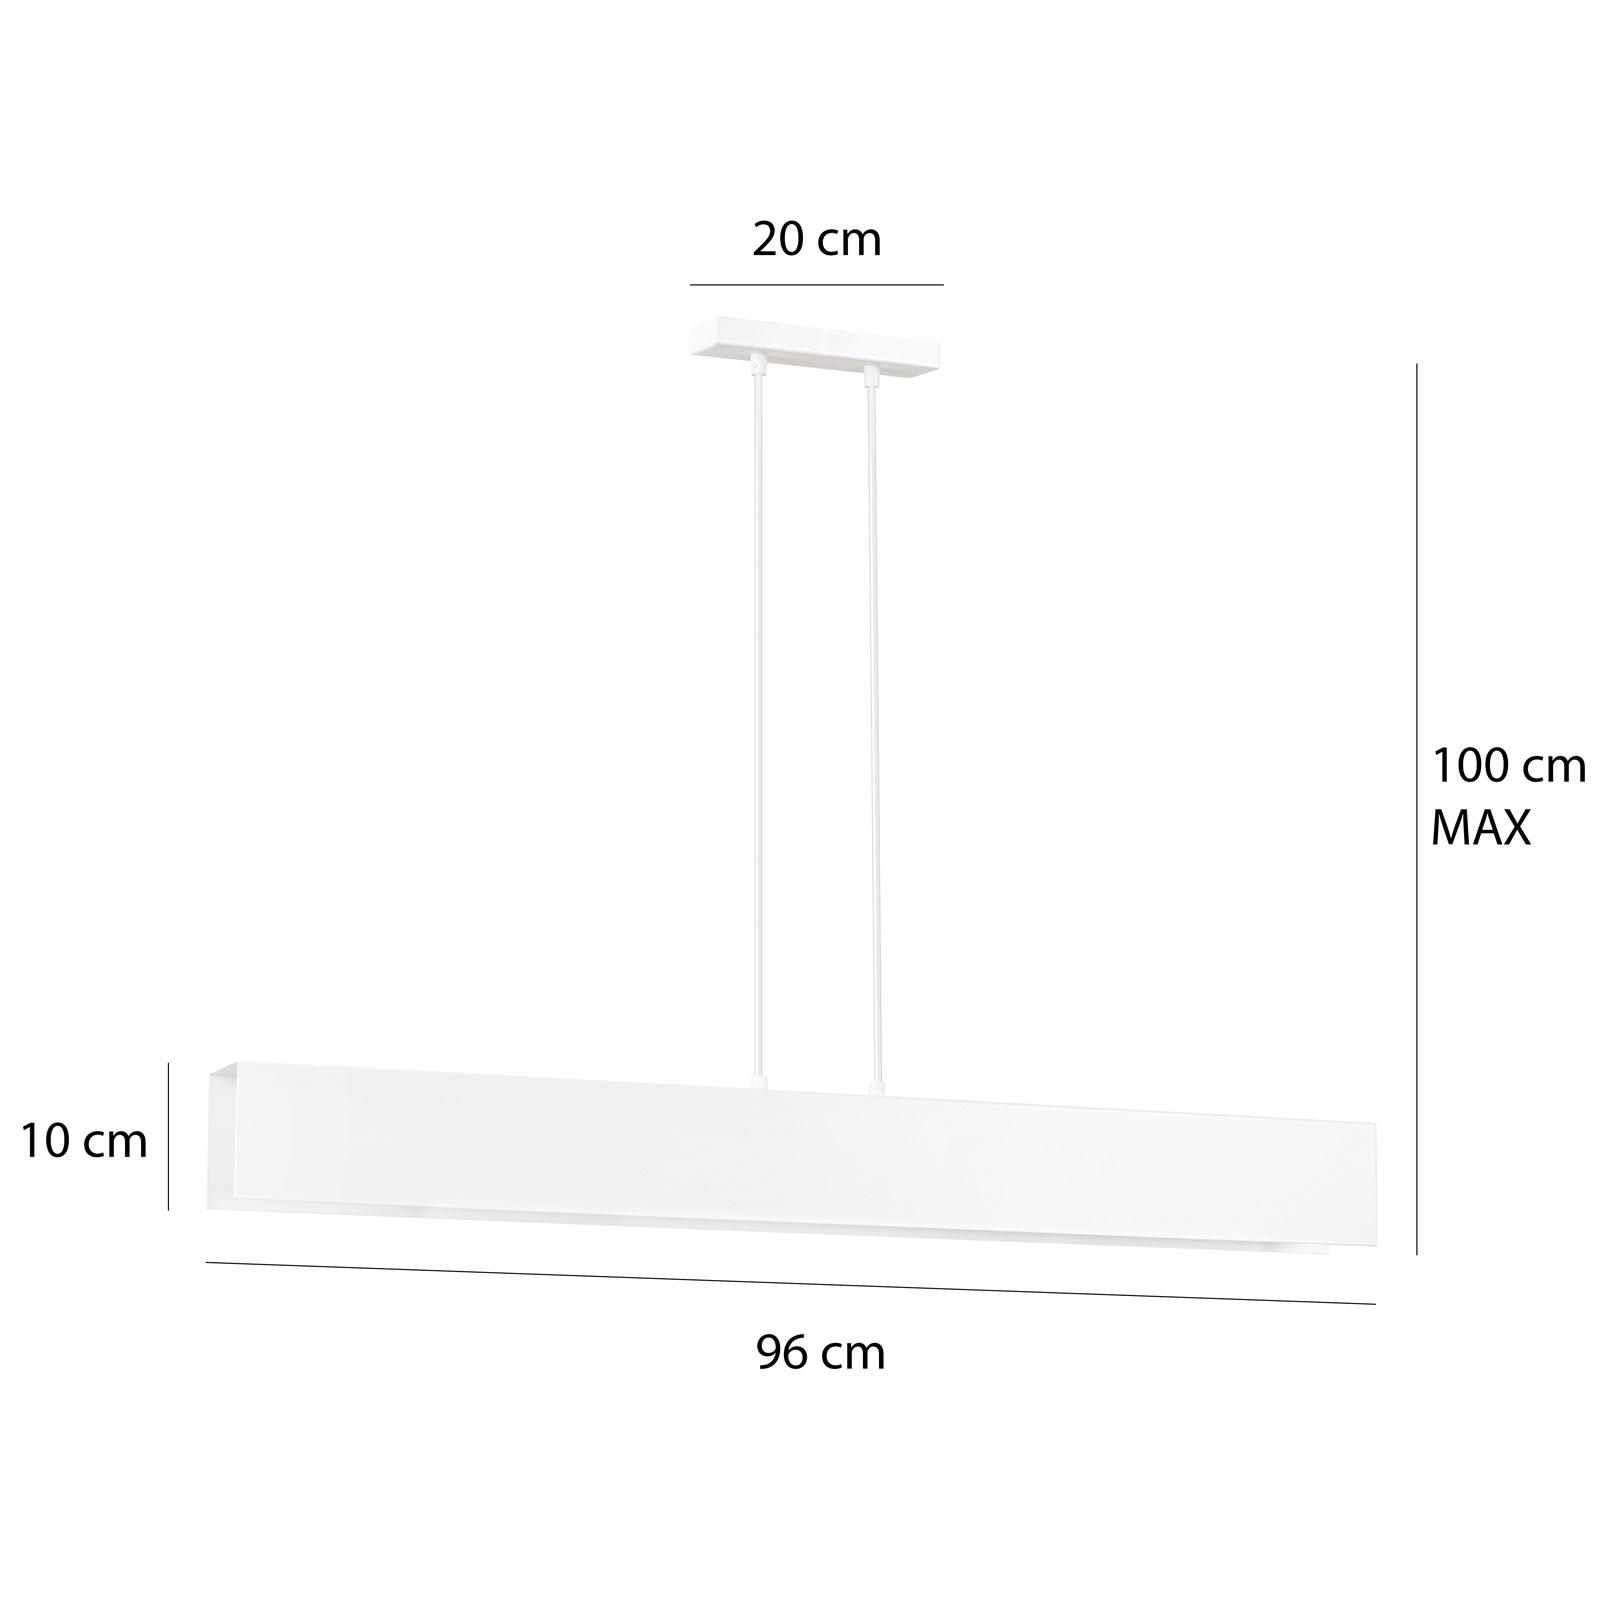 Hanglamp Gentor 4, lengte 96 cm in wit